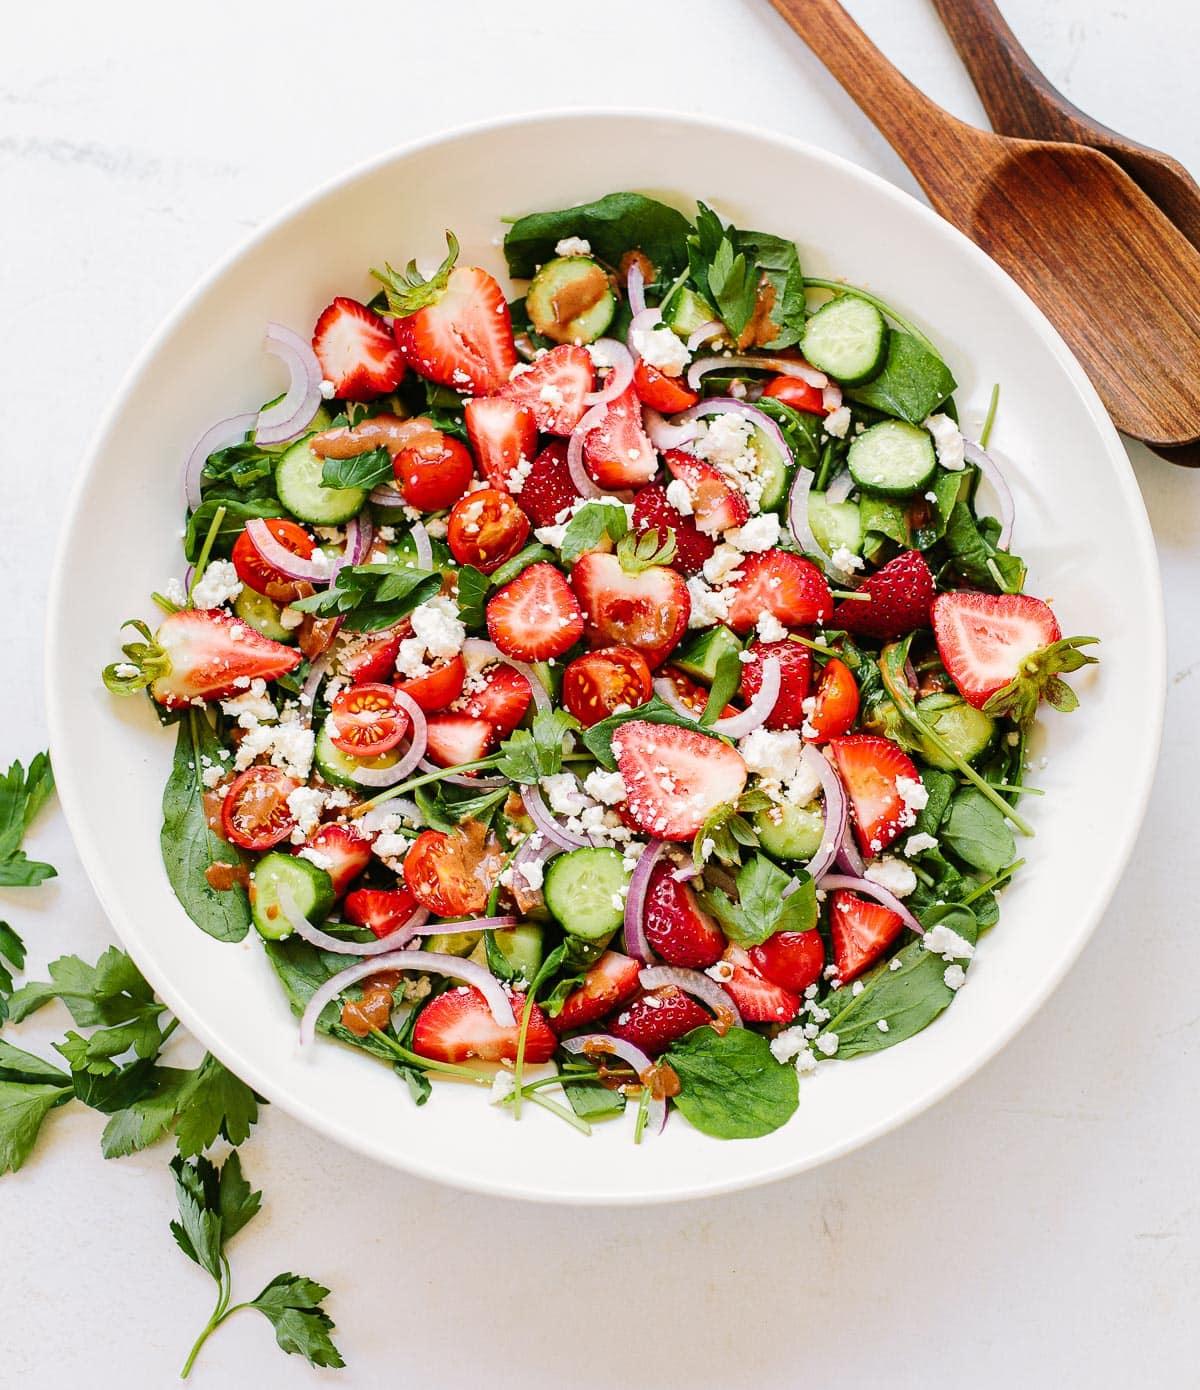 Summer Strawberry Salad with Feta